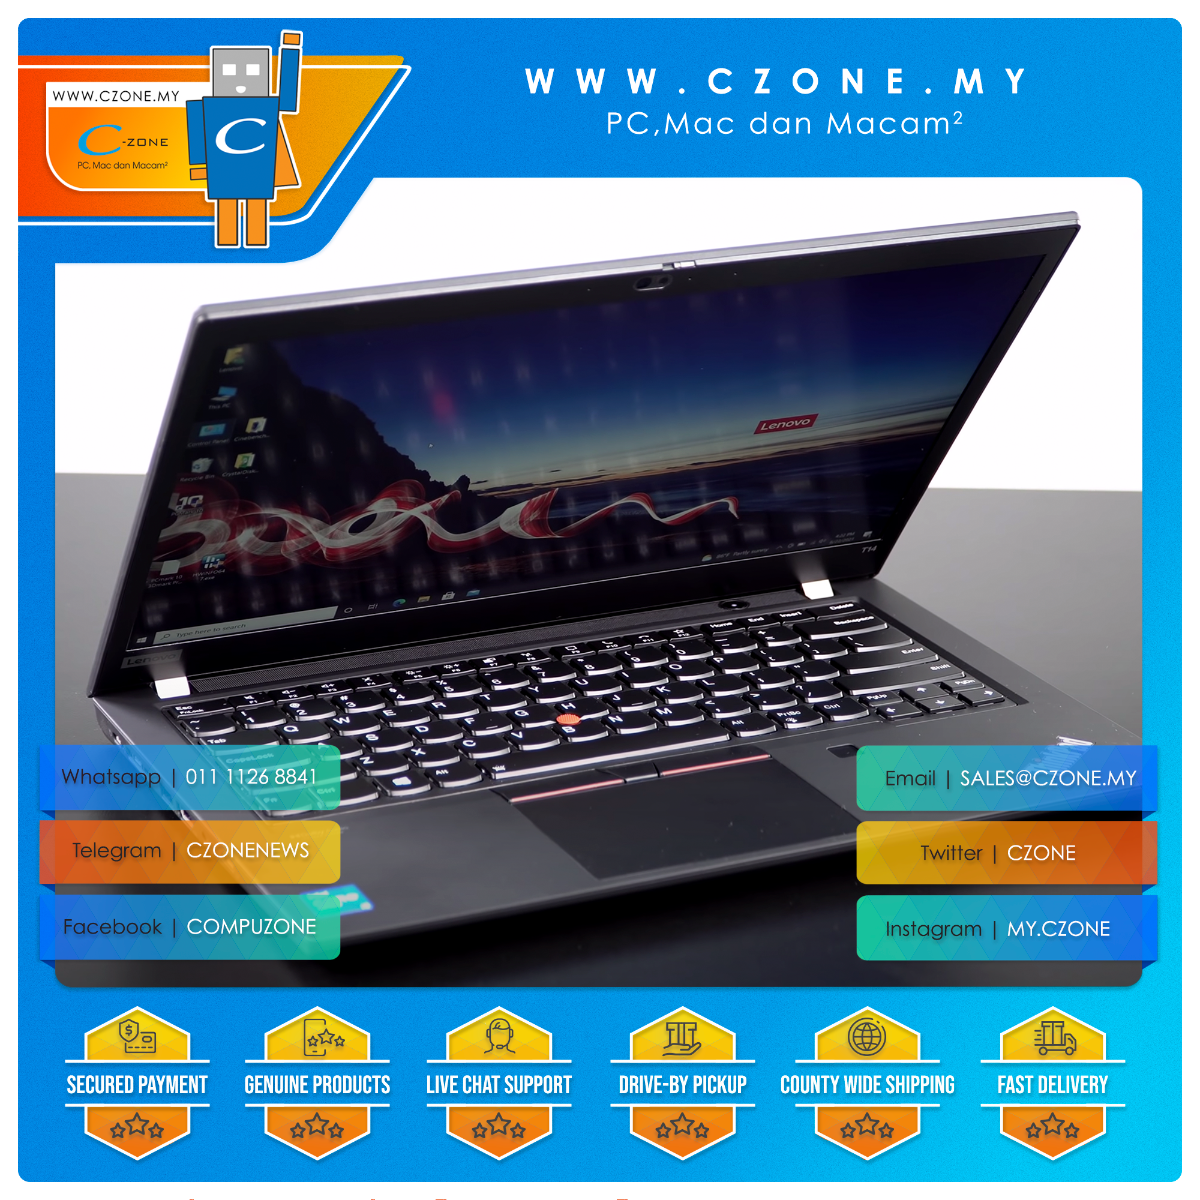 https://czone.my/czone/computer-systems/laptops.html?brand=5697